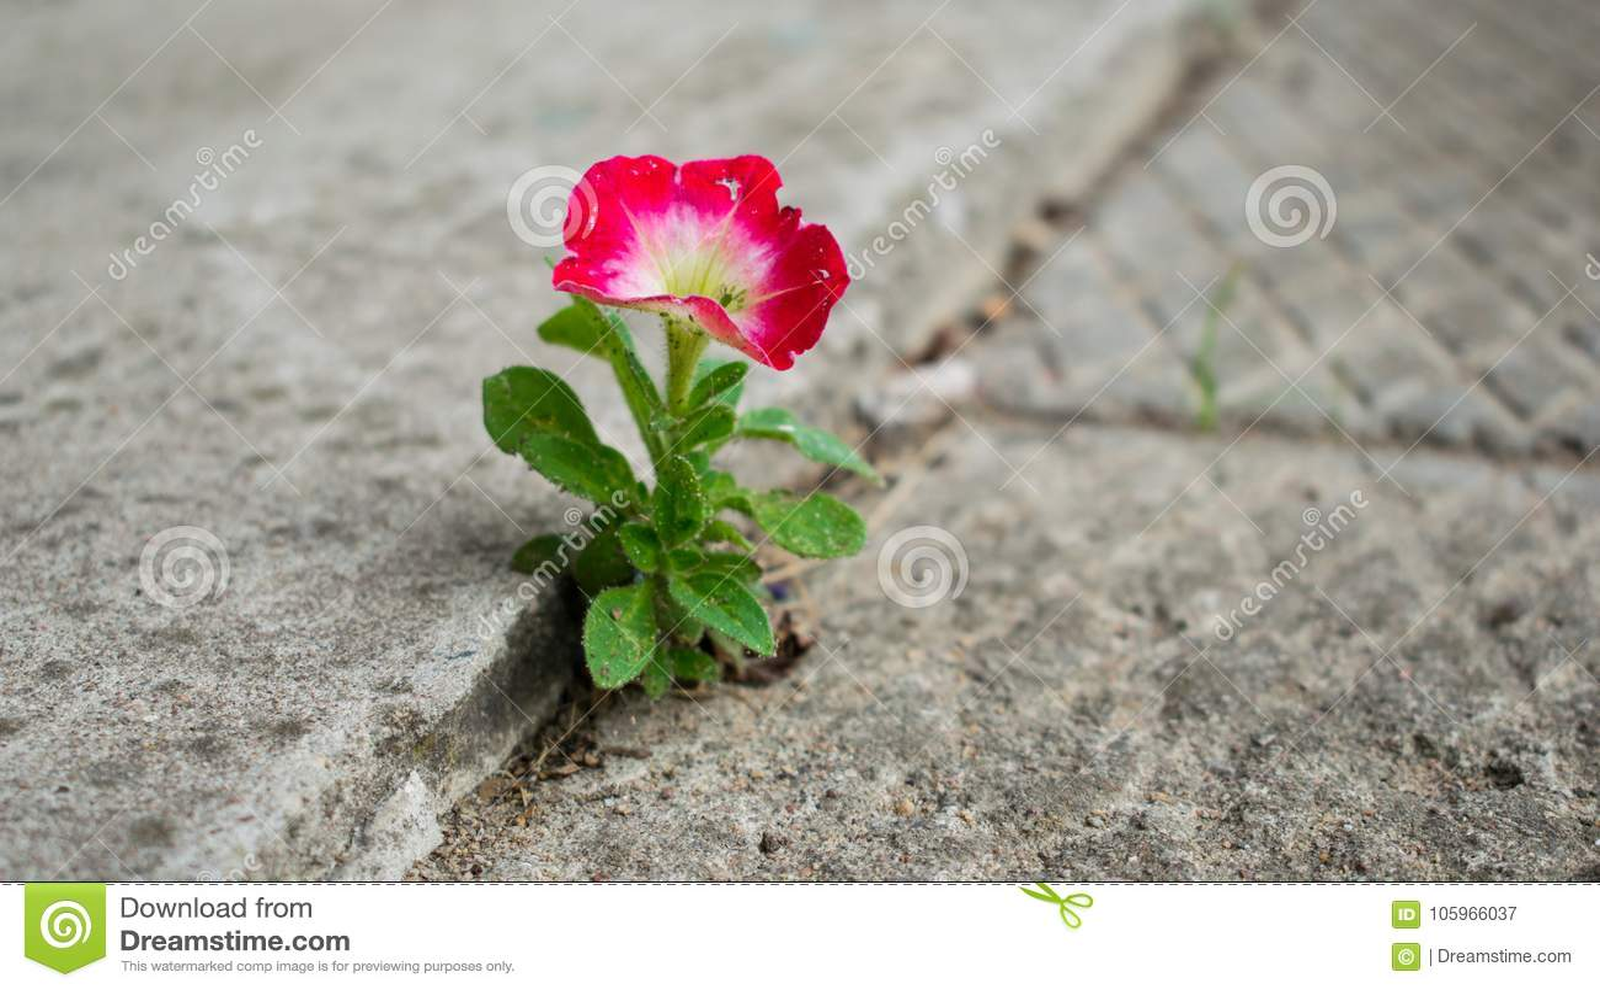 Цветок из бетона сухие смеси керамзитобетон